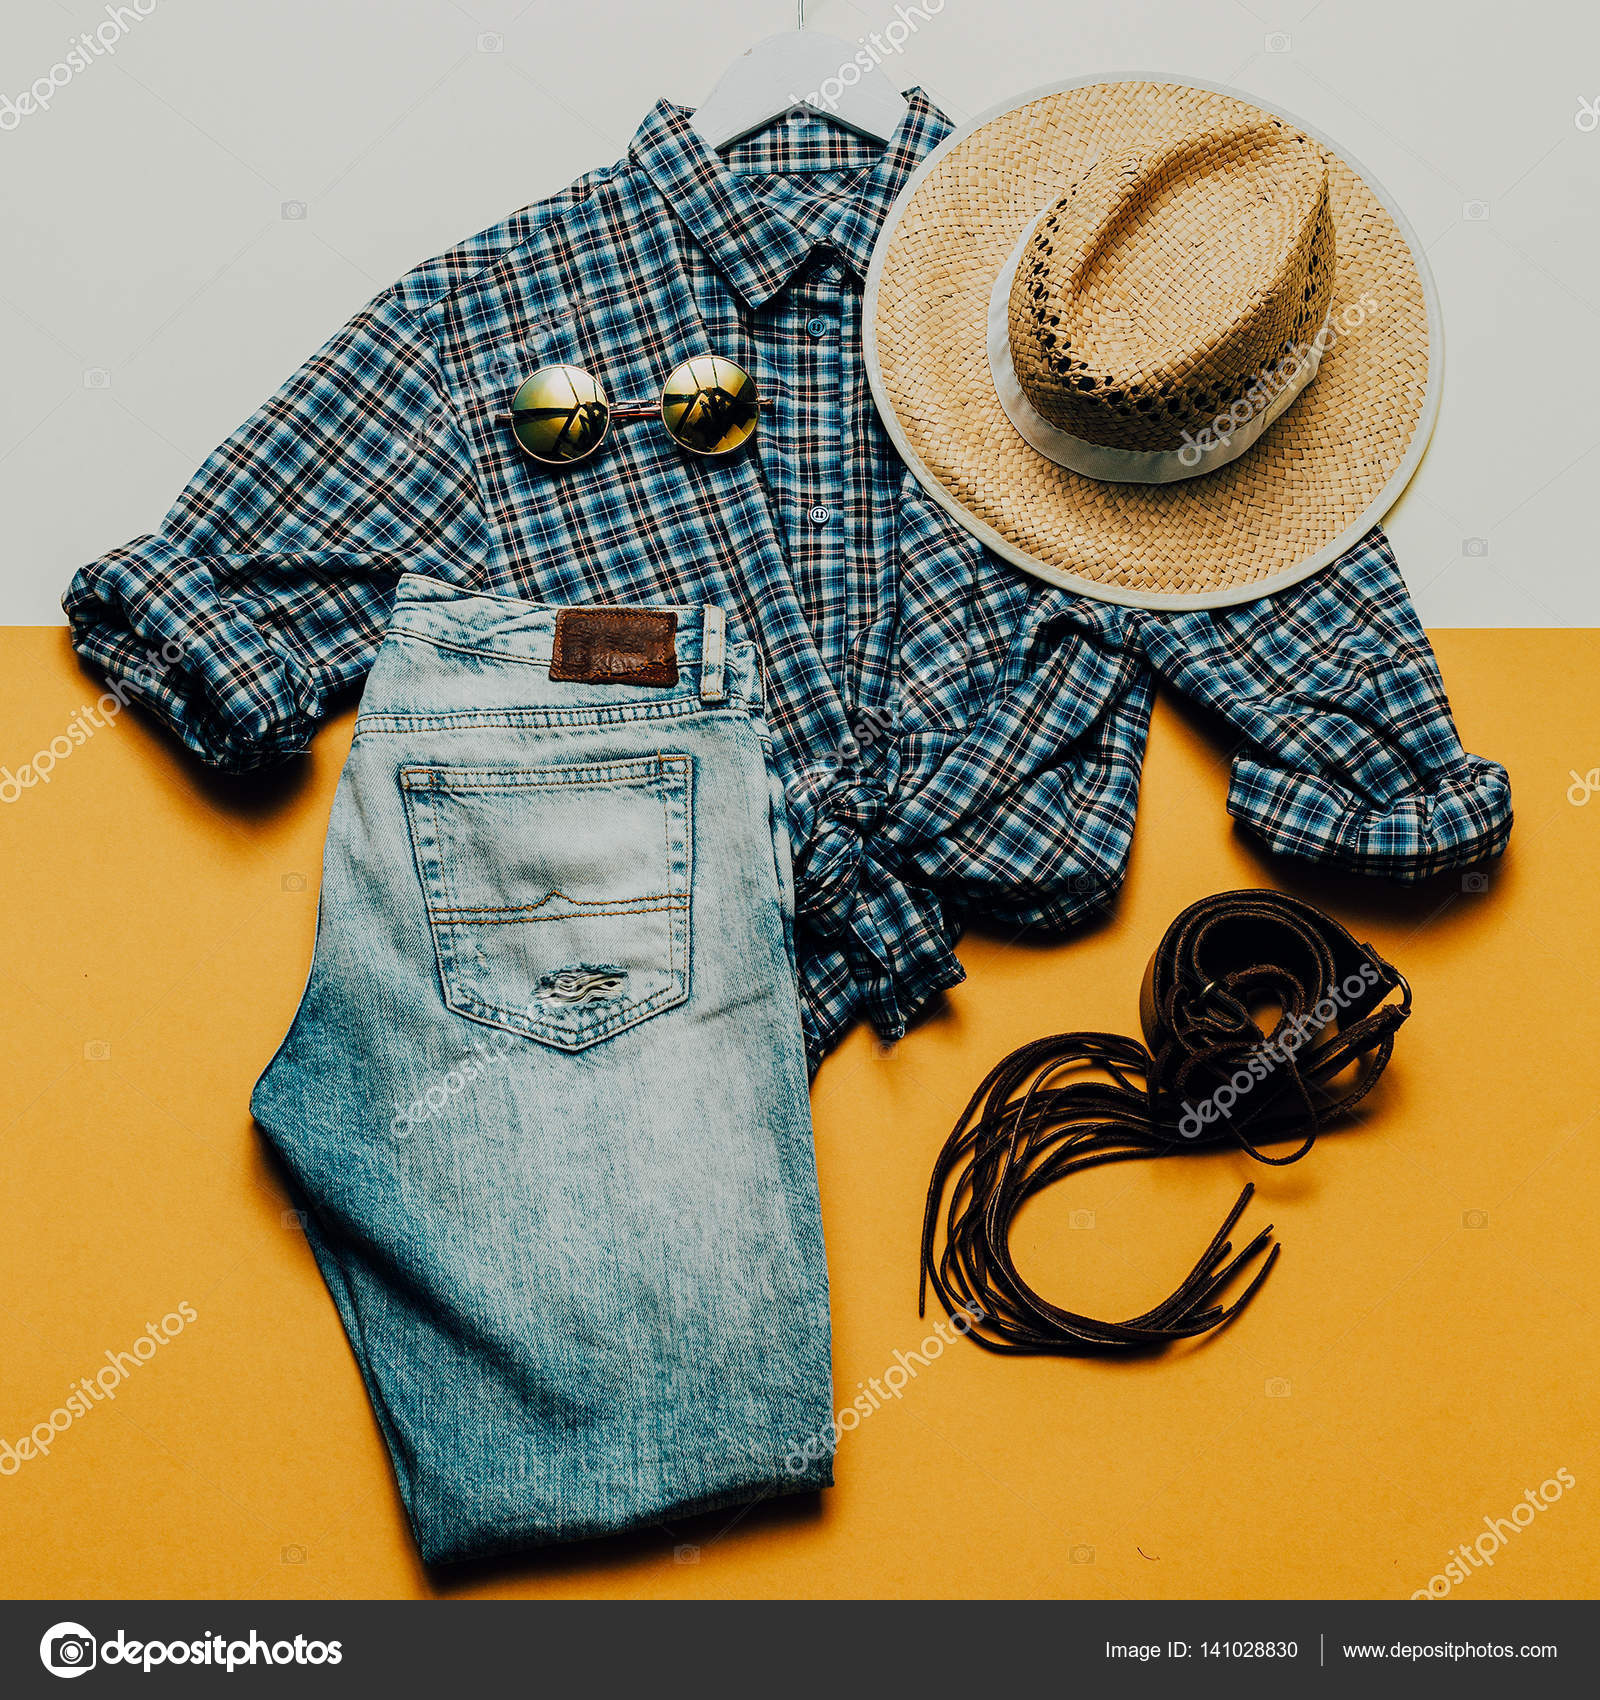 c139f647a46ed Roupa de cowboy Country. Acessórios de moda. estilo de moda — Fotografia de  Stock